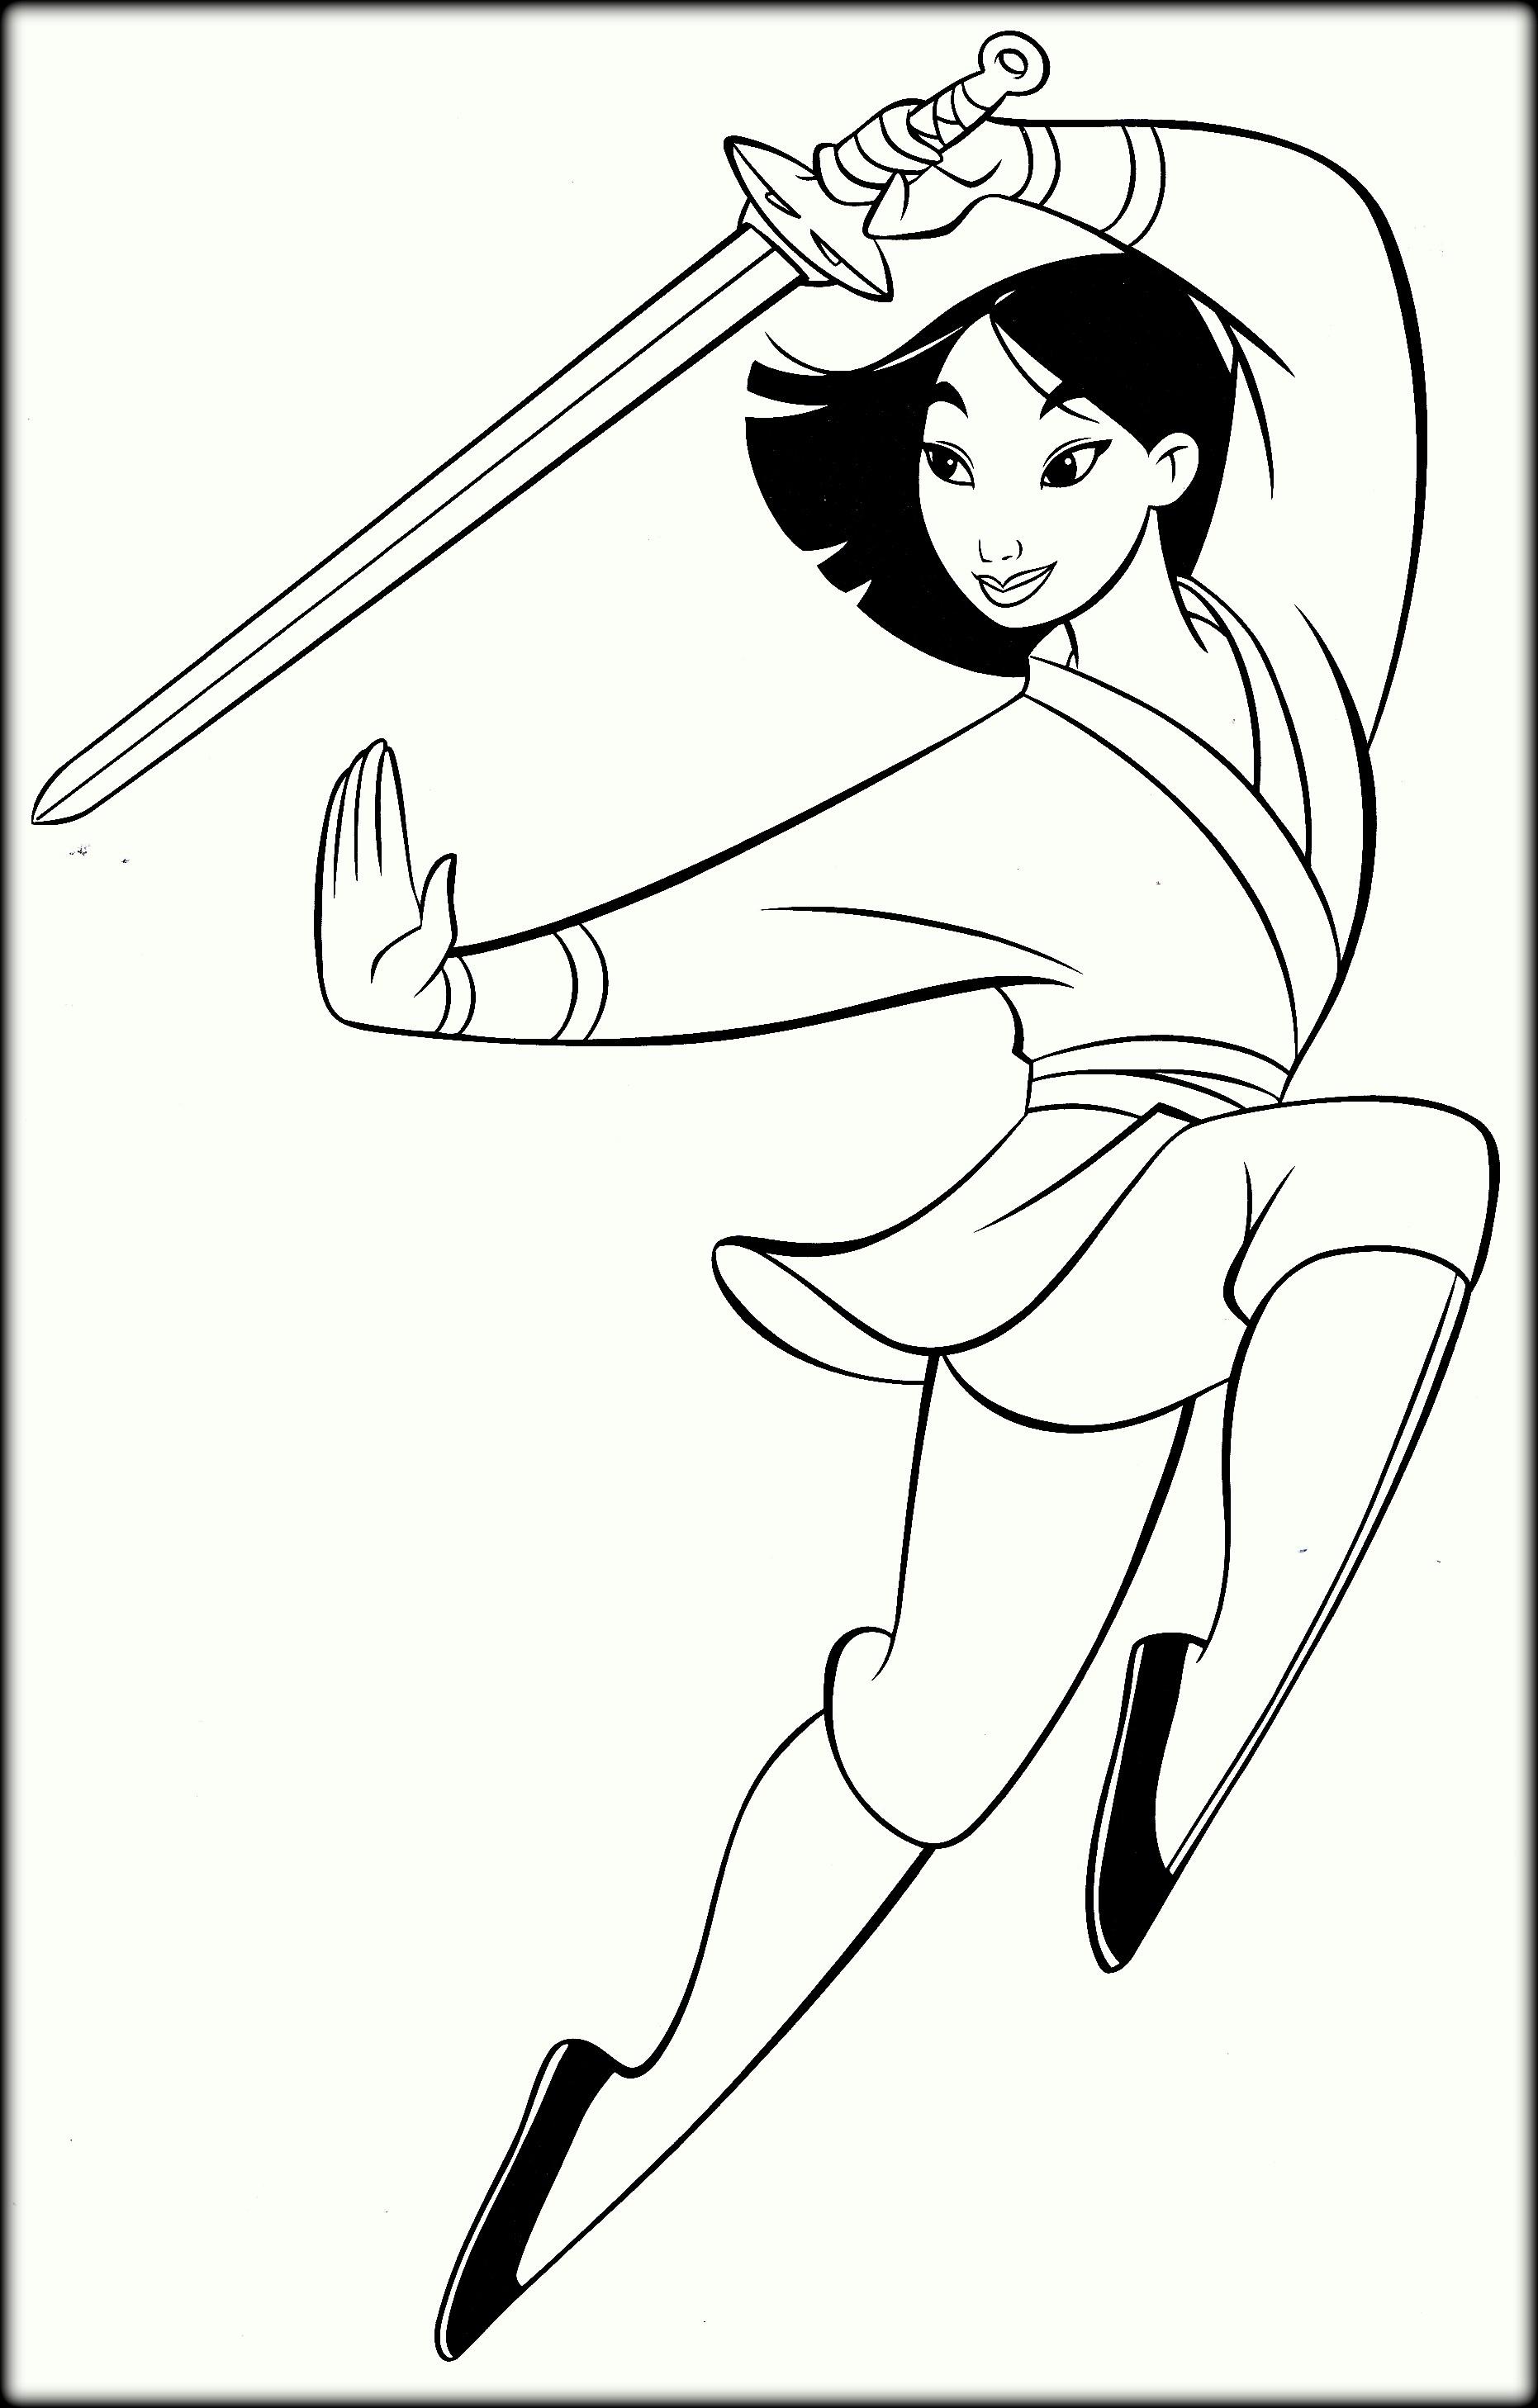 1862x2916 Mulan Coloring Pages Warrior For Kids Unique Disney Princess Mulan